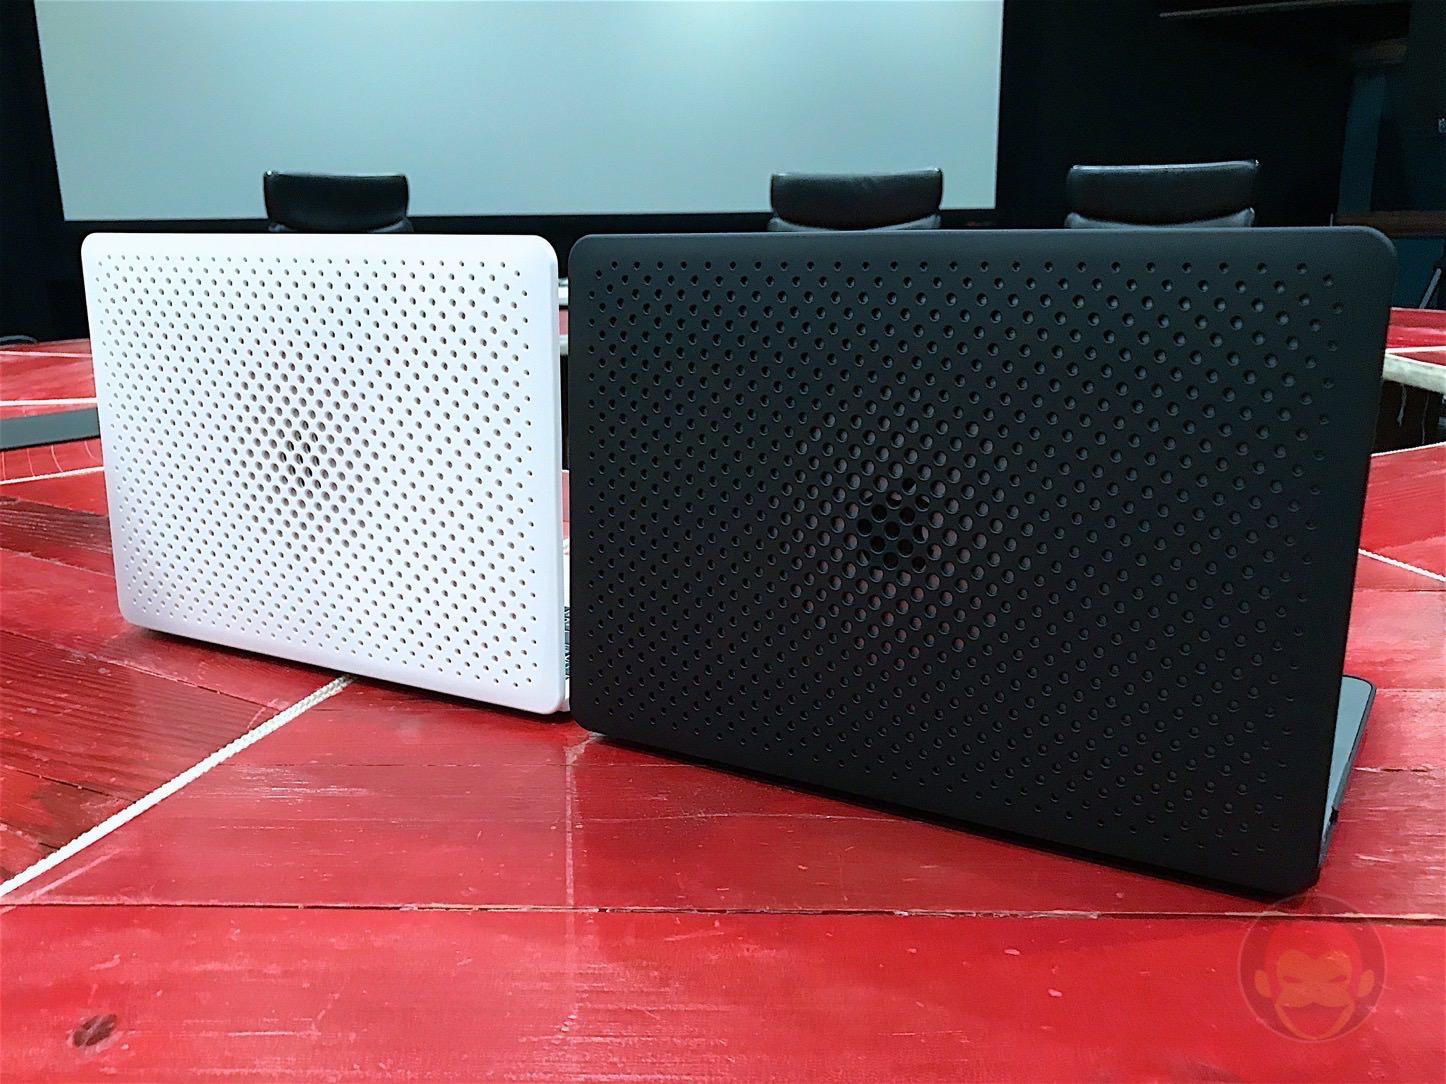 AndMesh-Mesh-Case-for-MacBookPro13-13.jpg